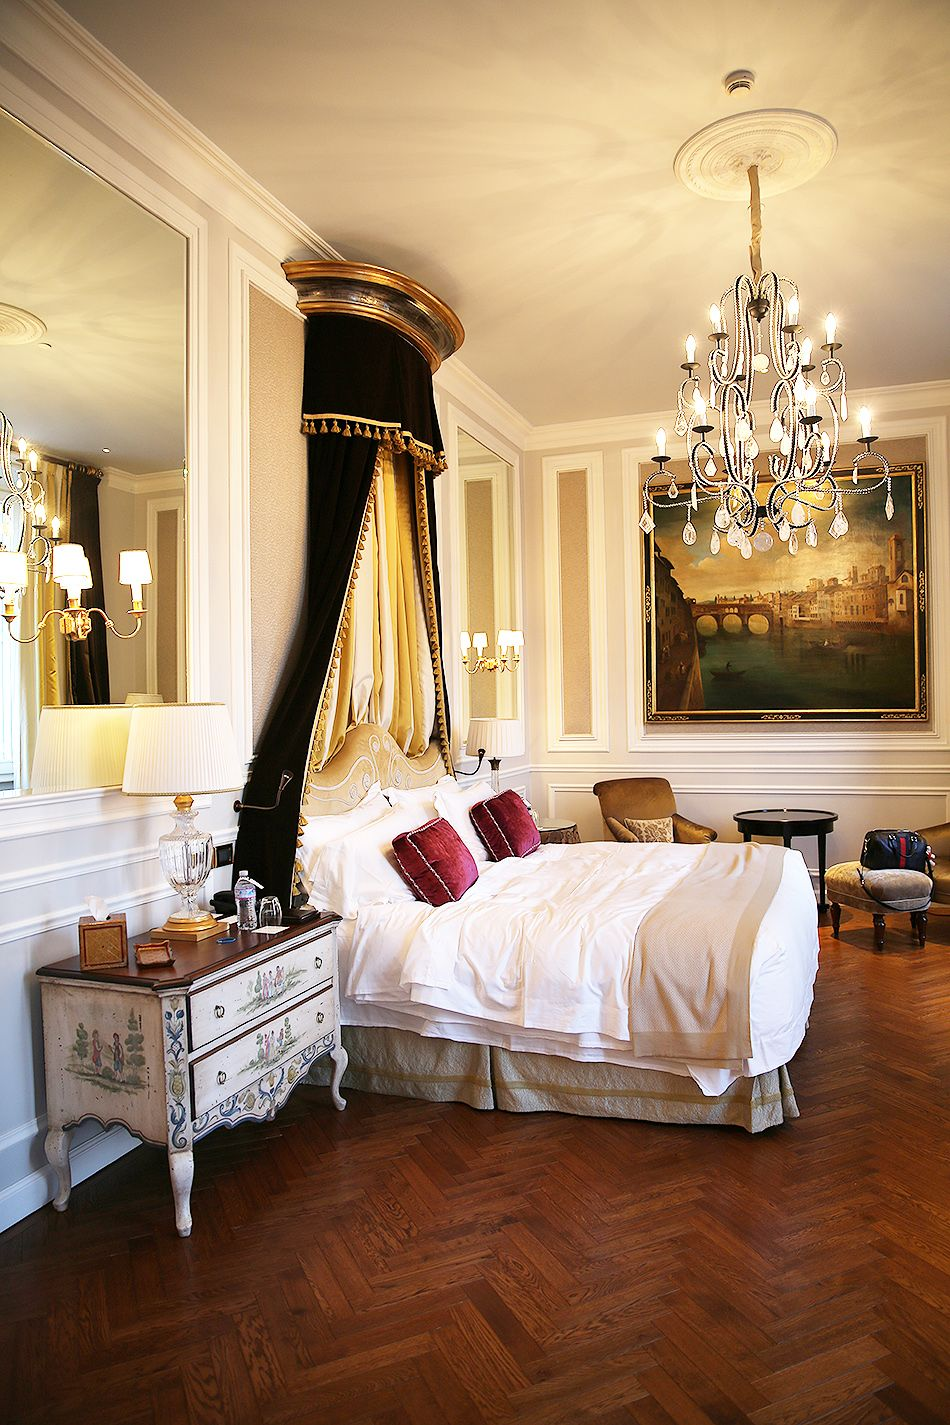 Luxury Hotel Bedrooms: St Regis Hotel, Florence, Italy. Master Bedroom. Exclusive